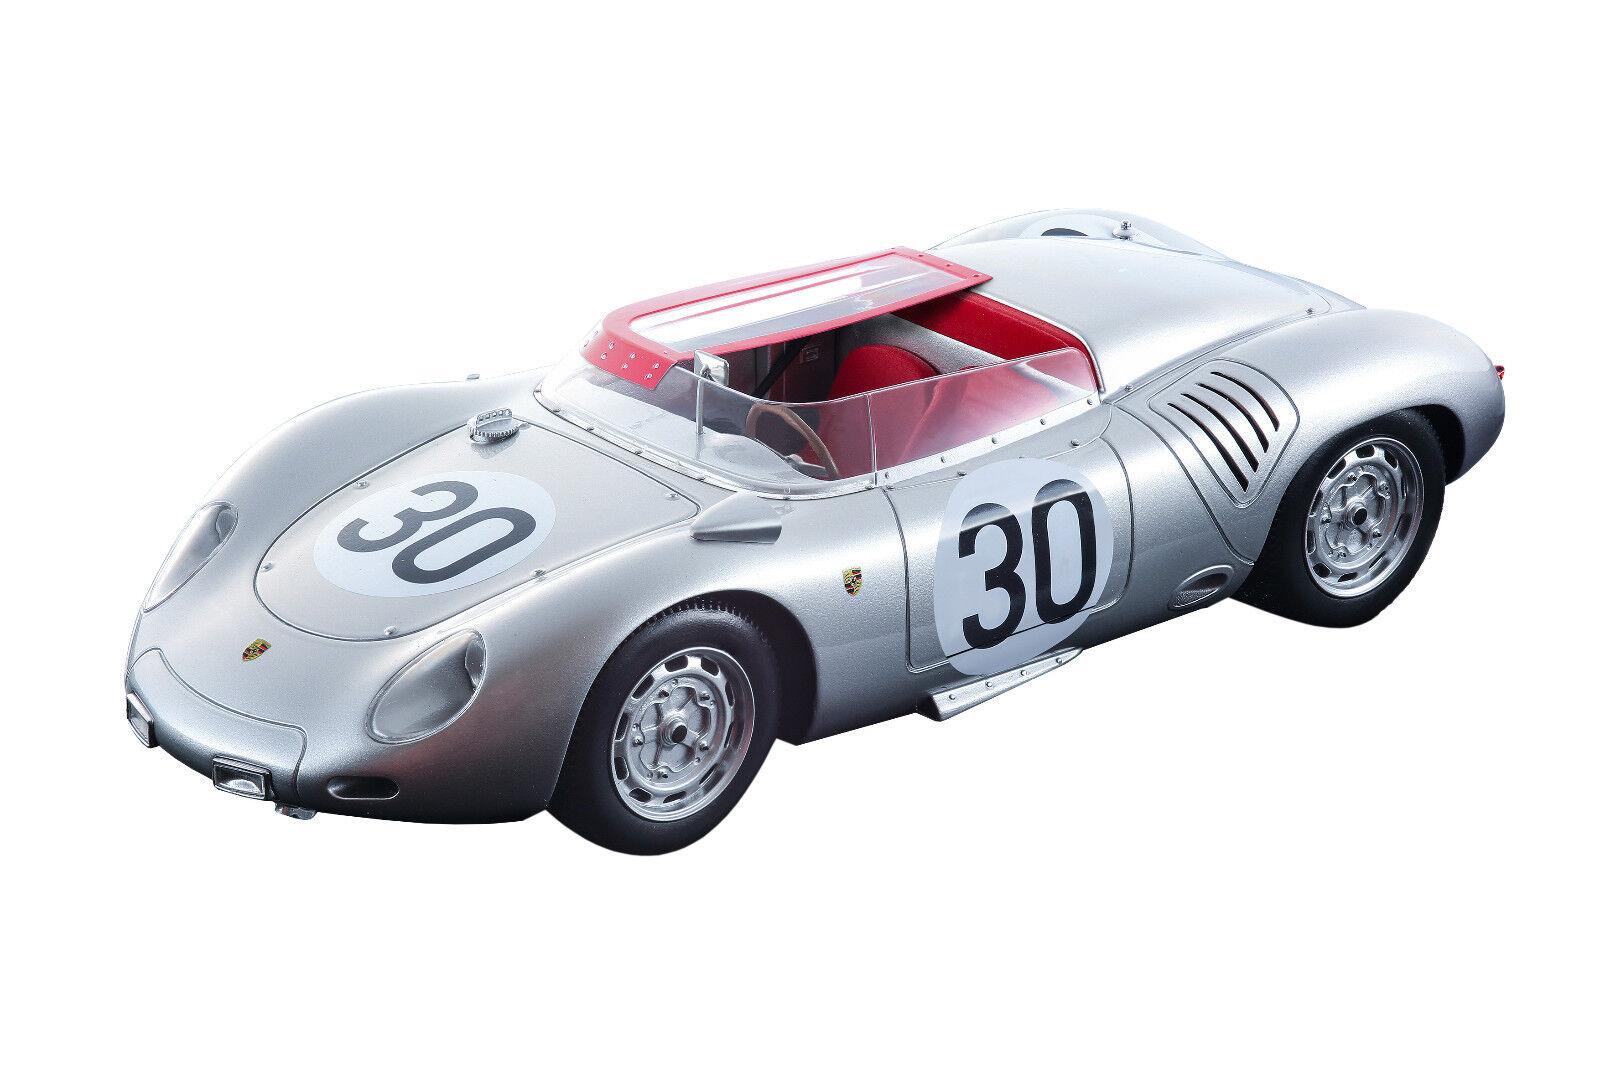 Porsche 718 RSK von frankeberg   storez 1958 leman1 leman1 leman1   18 tecomondel tm18 - 82b c51